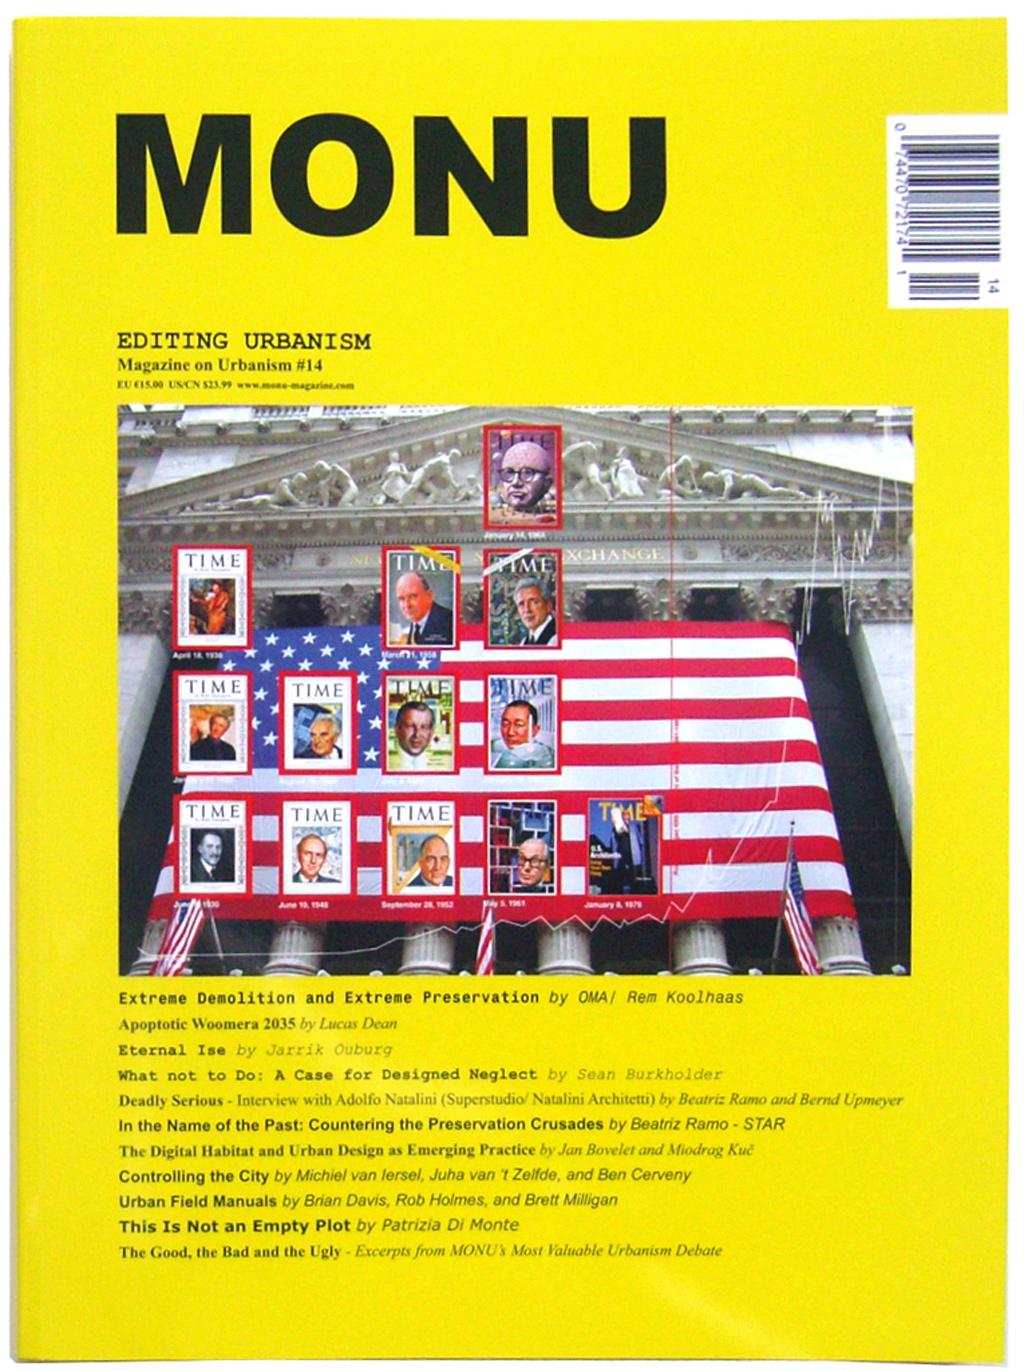 MONU magazine on urbanism 14 – Editing Urbanism